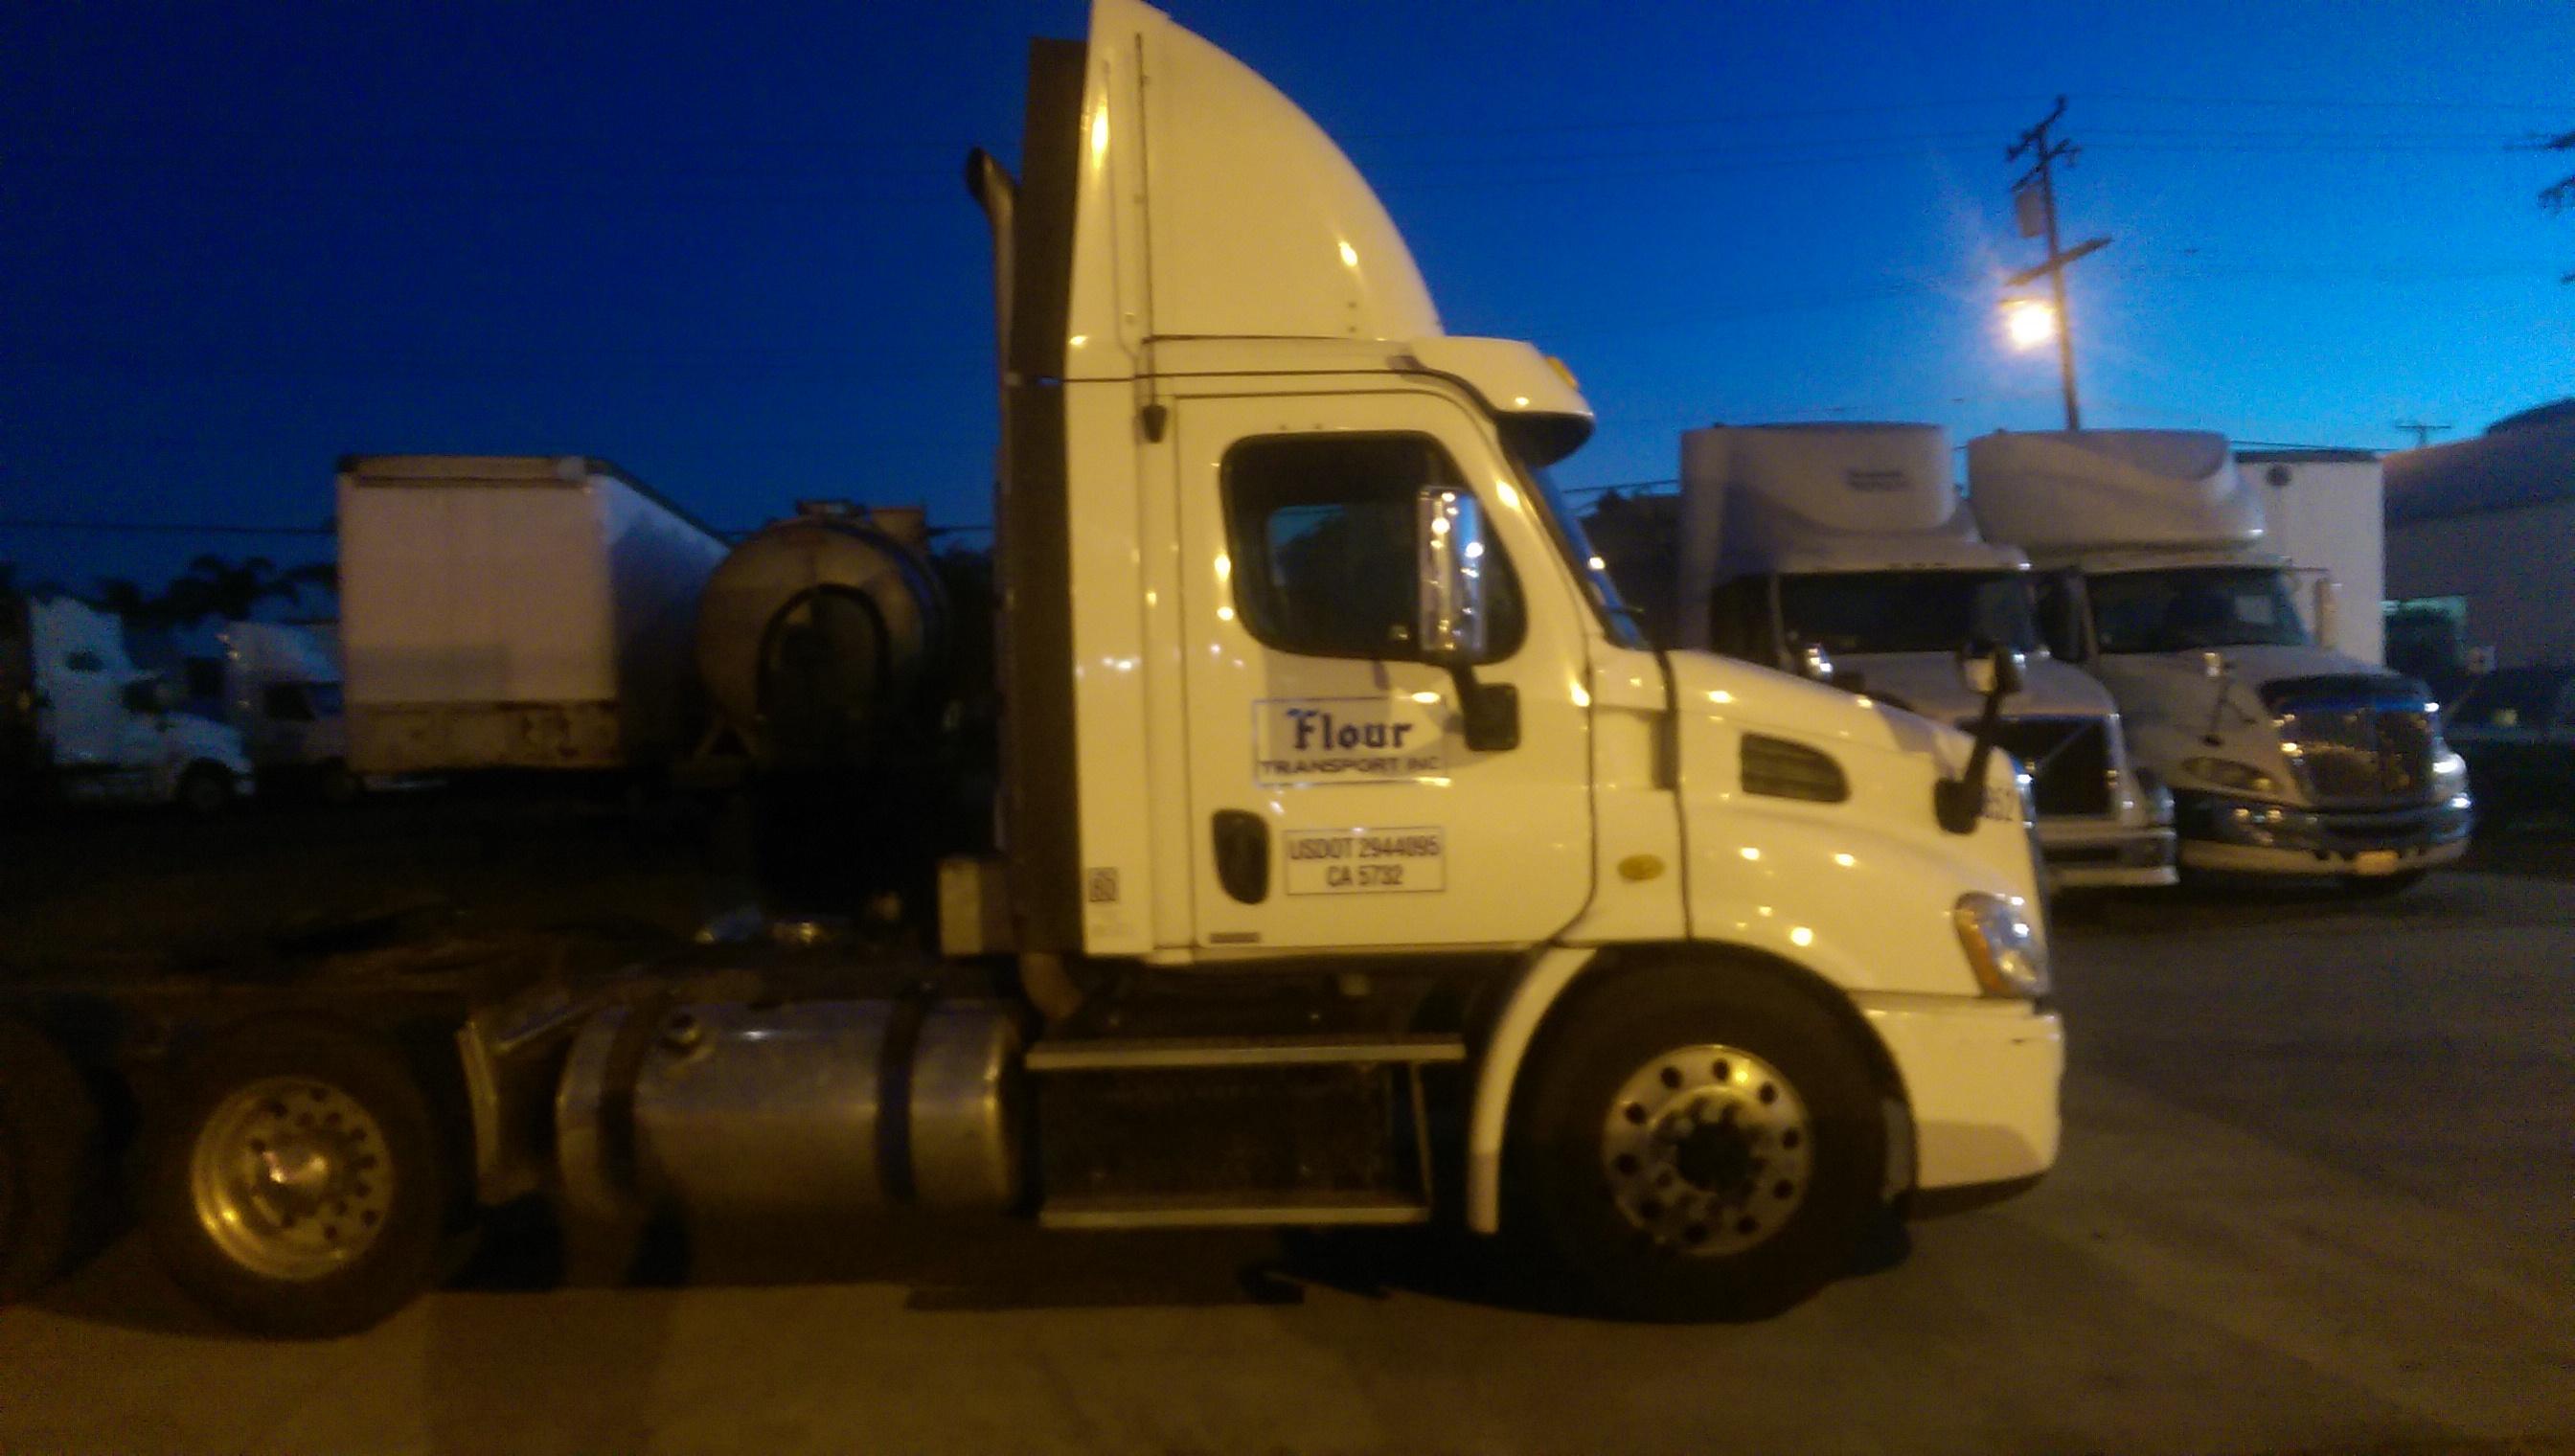 Flour Transport